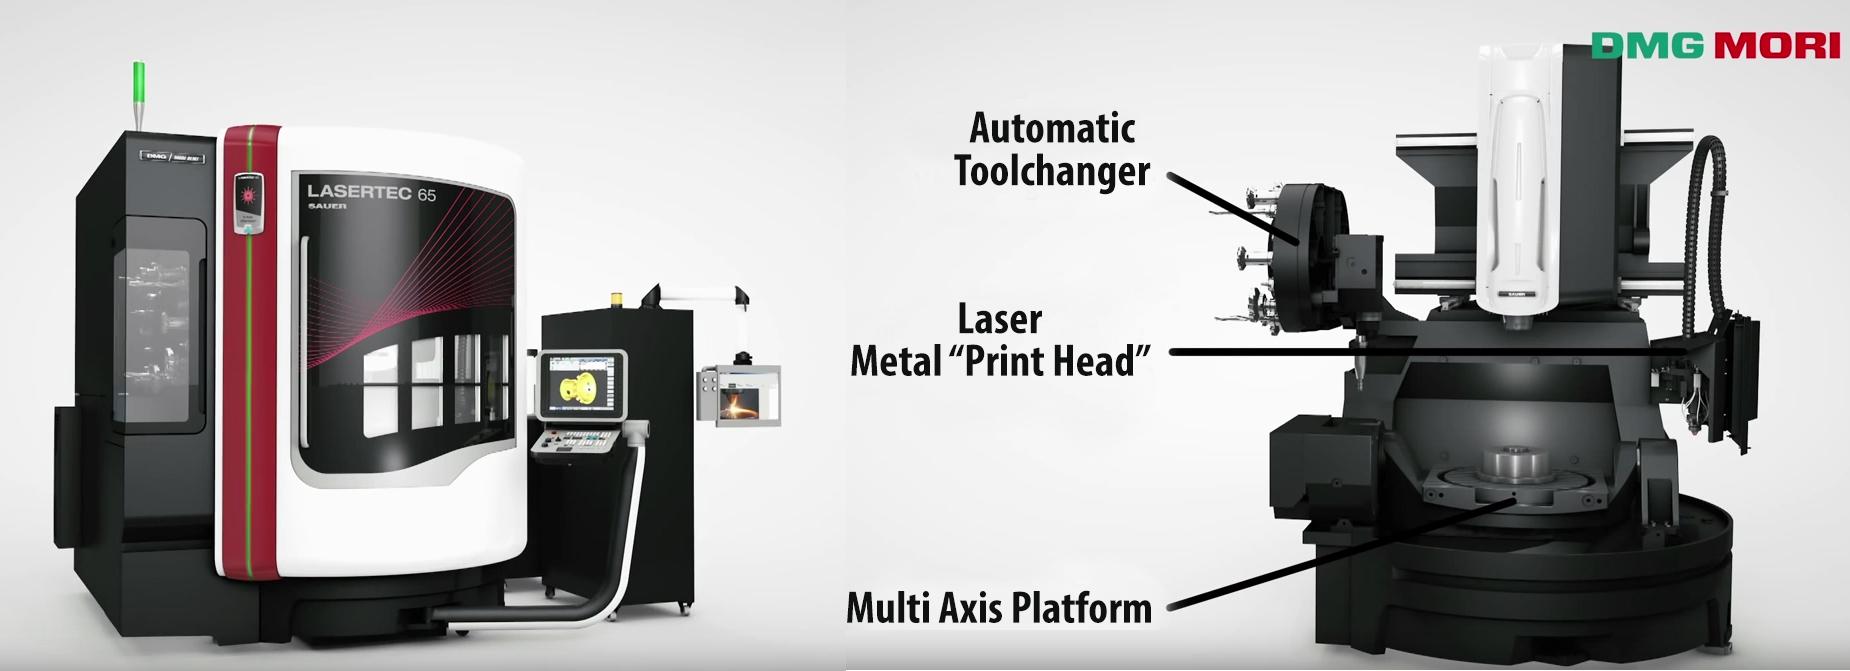 hybrid-cnc-3d-printer-metal-machining-5-axis-dmg-mori-shareahack_concept